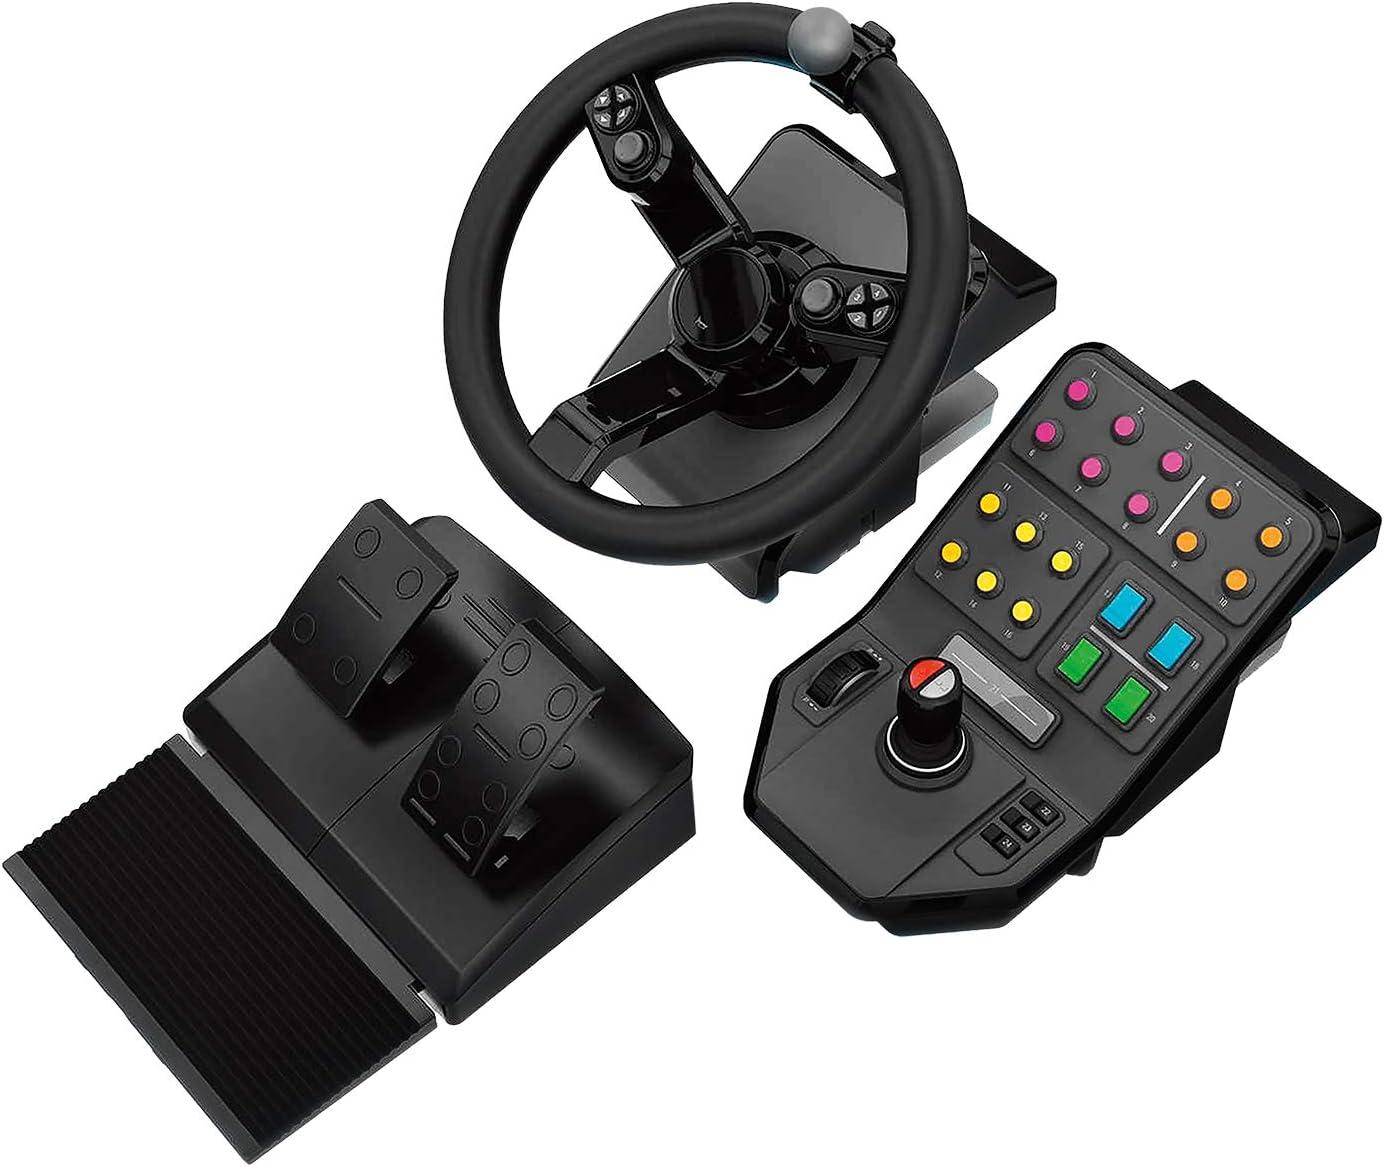 volante y equipamiento Logitech G Farm Simulator 19 o mayor